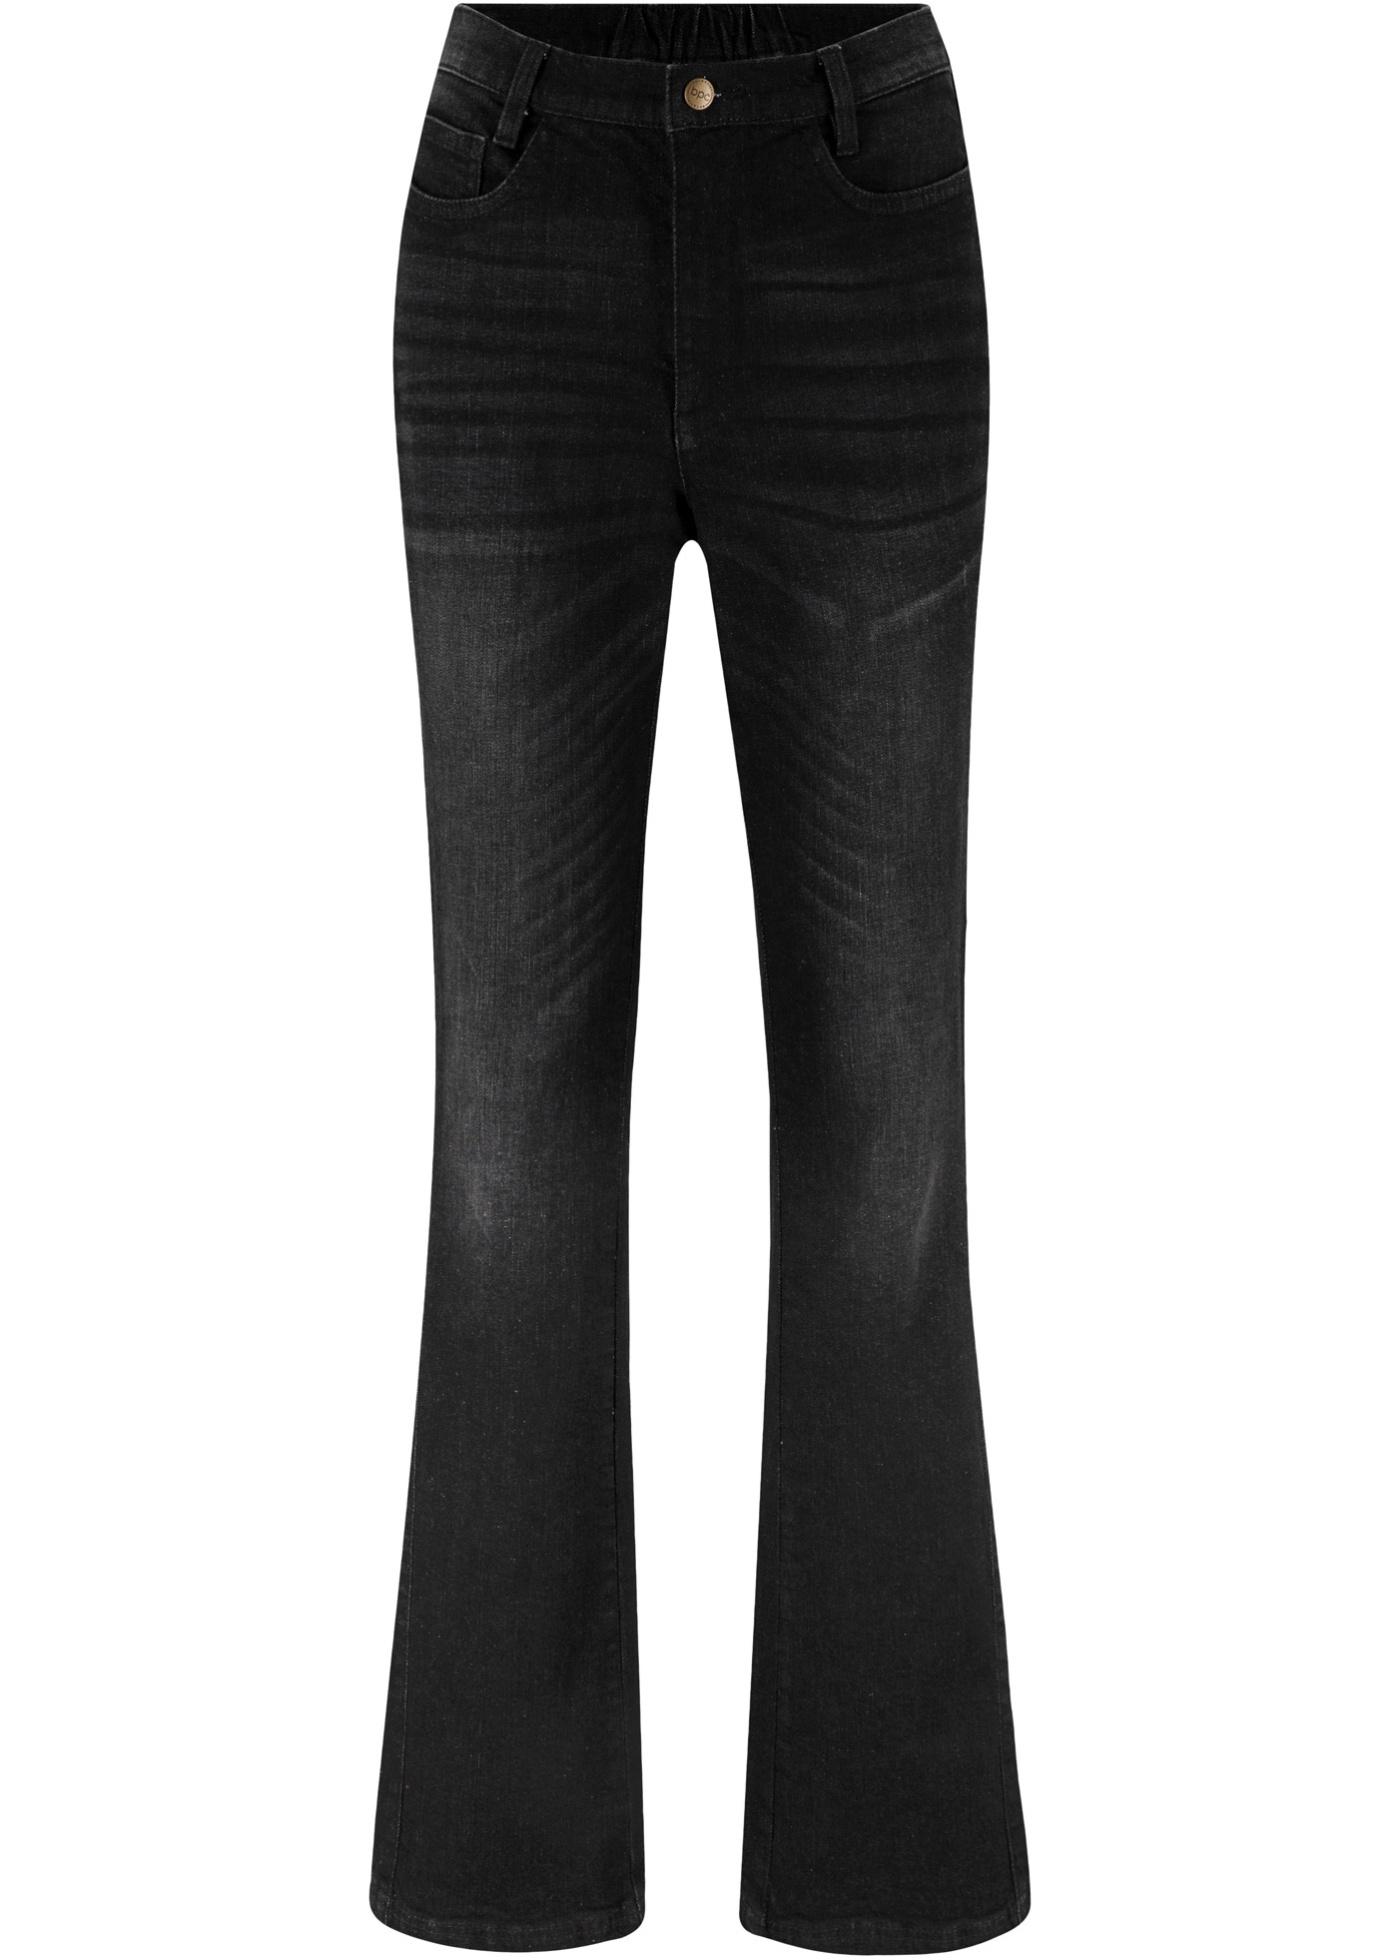 Bonprix - Jeans med utst?¤llda ben 299.00